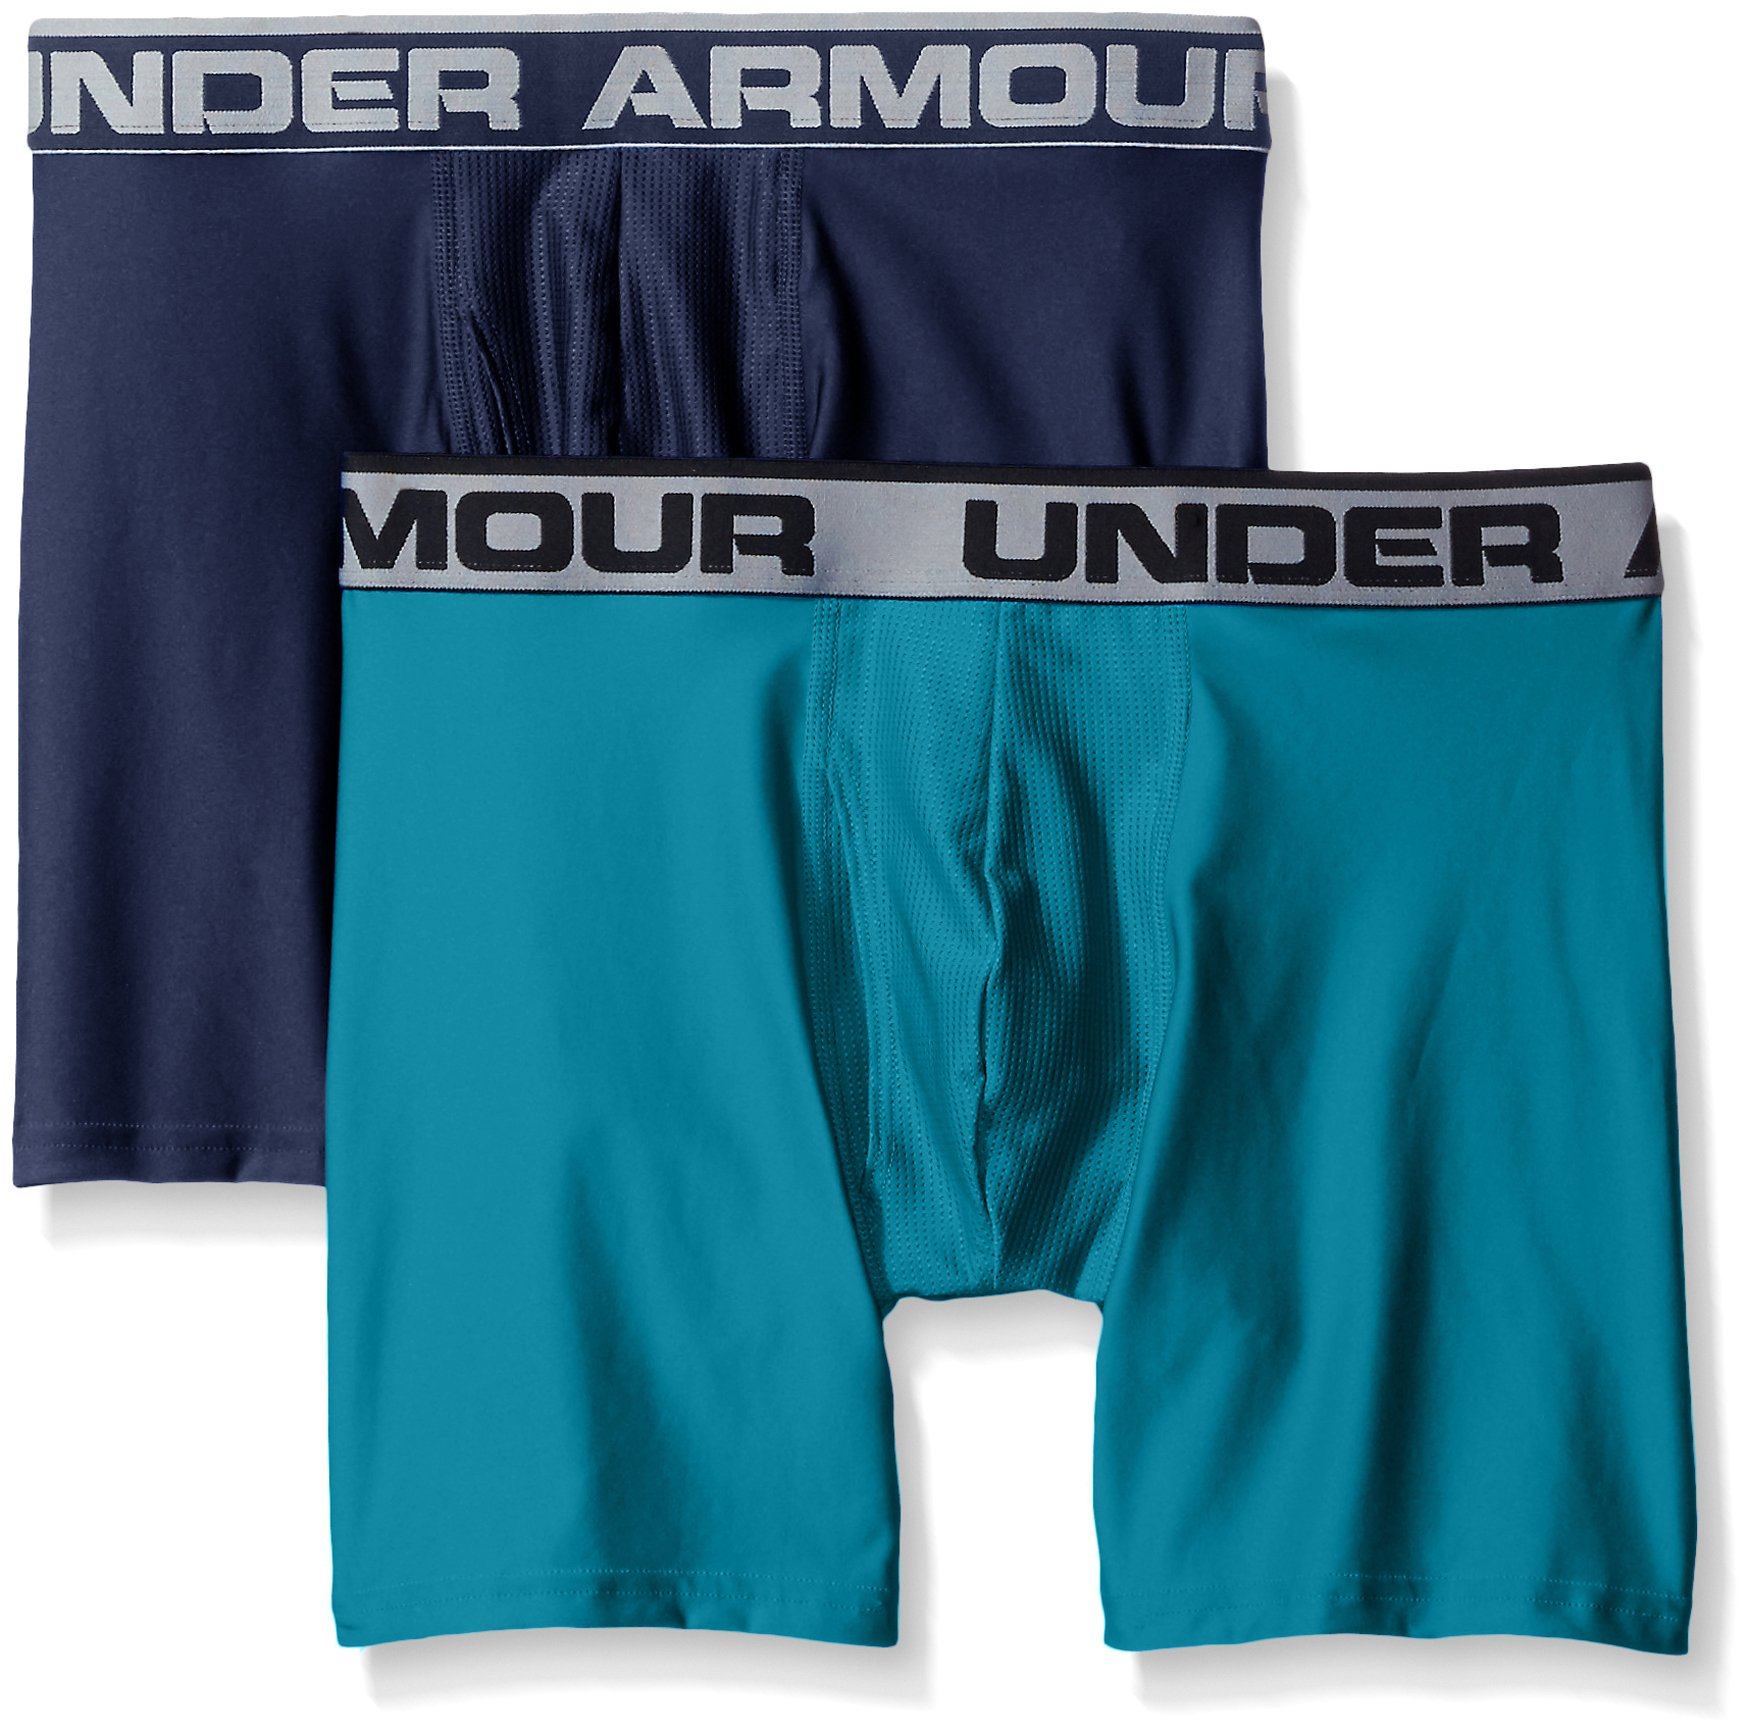 "Under Armour Men's Original Series 6"" Boxerjock, Midnight Navy/Turquoise Sky, Large, Pack of 2"